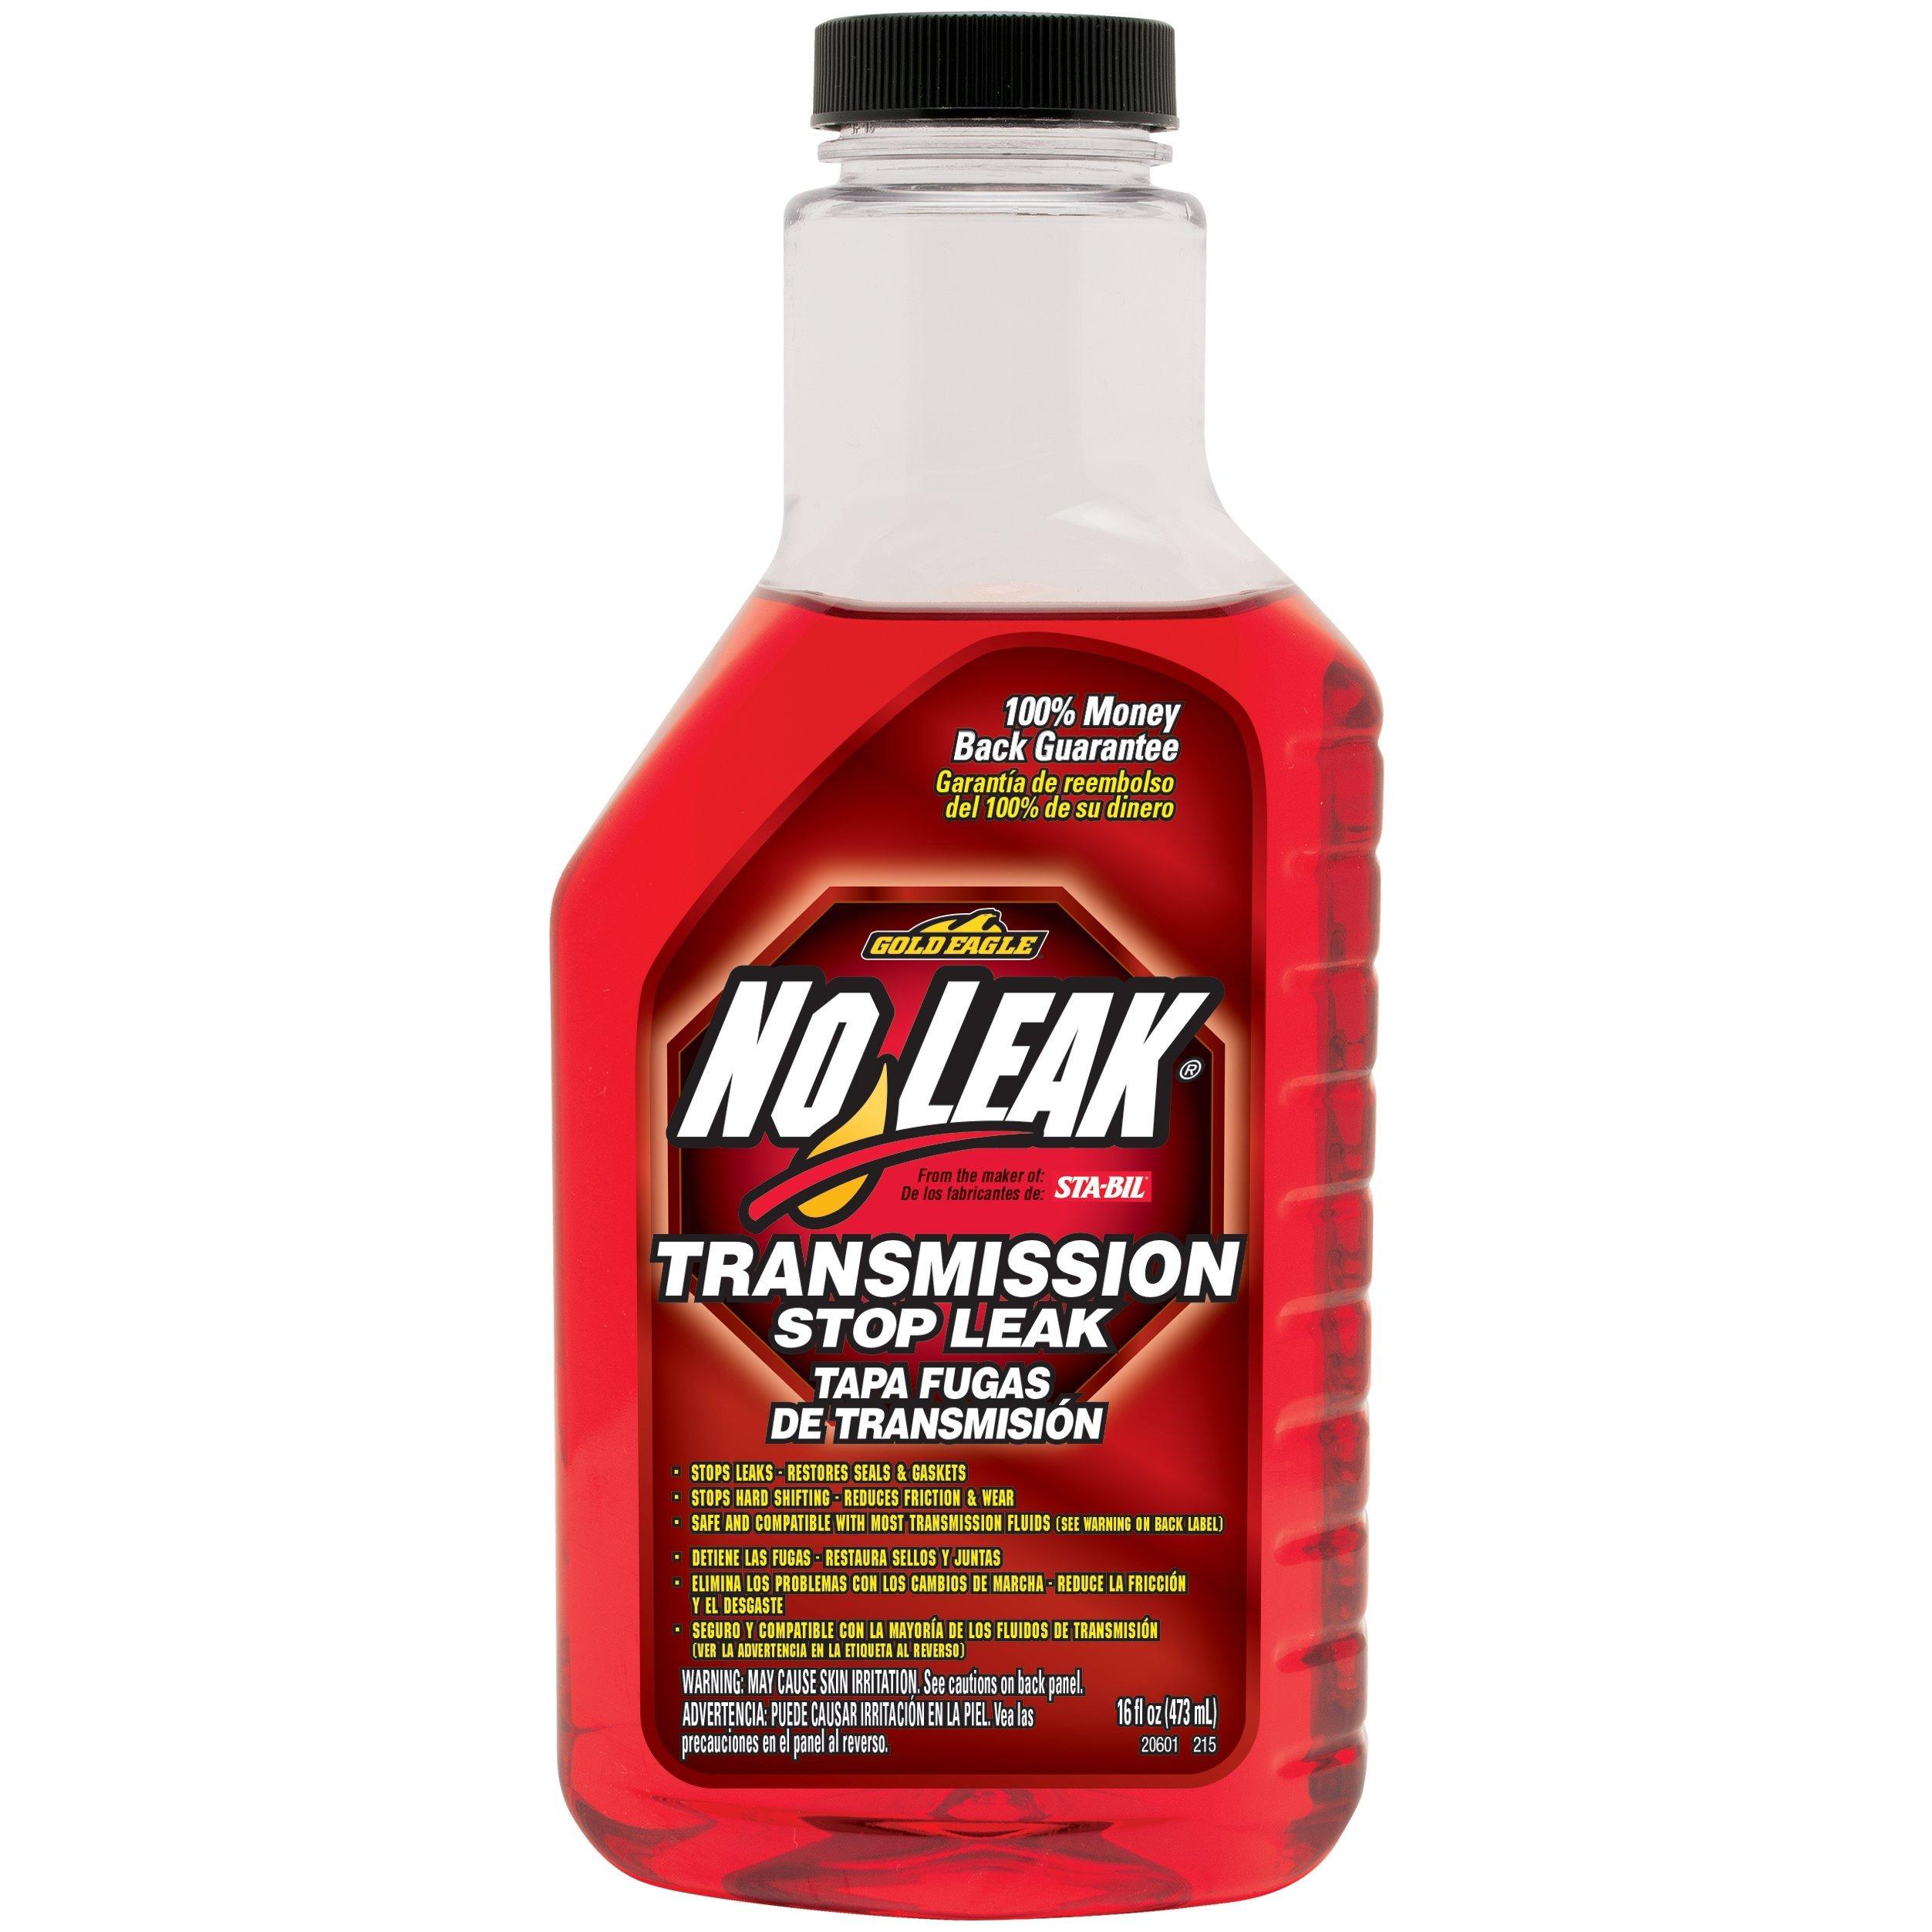 NO LEAK 20601-6PK Transmission Stop Leak, (Pack of 6) by NO LEAK